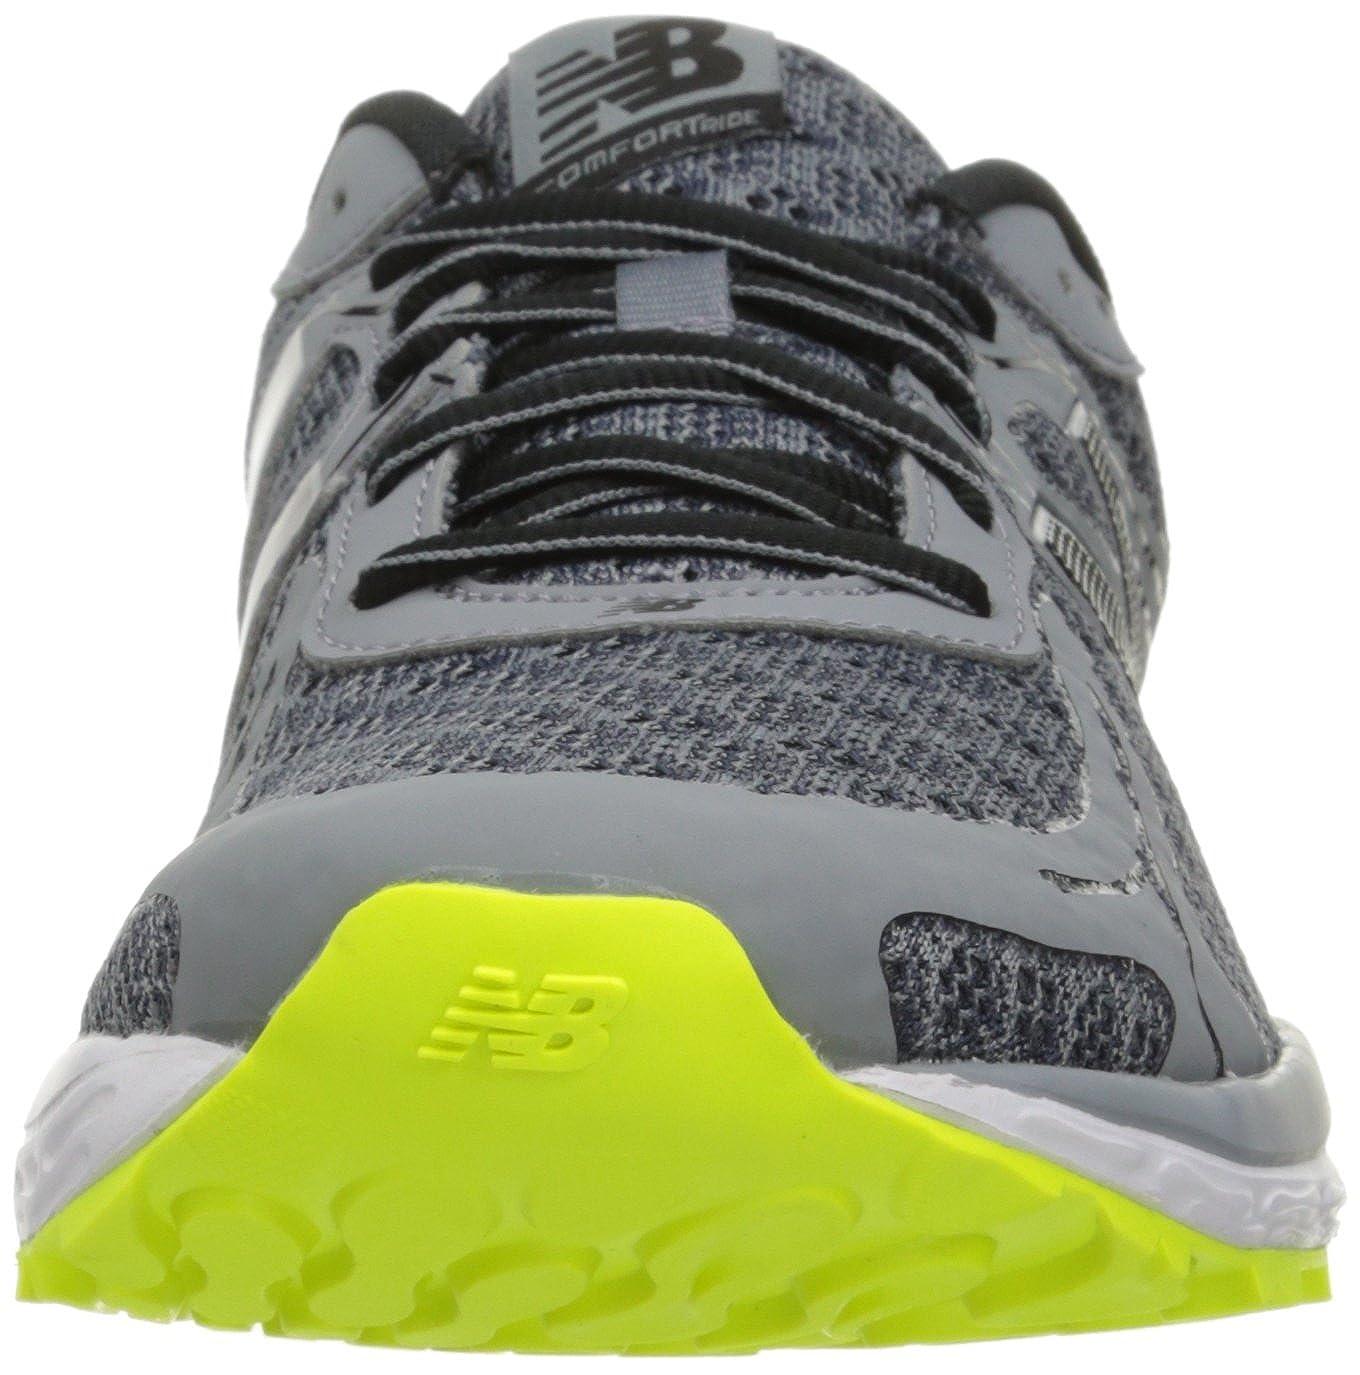 New Balance Men s 720v3 Comfort Ride Running Shoe